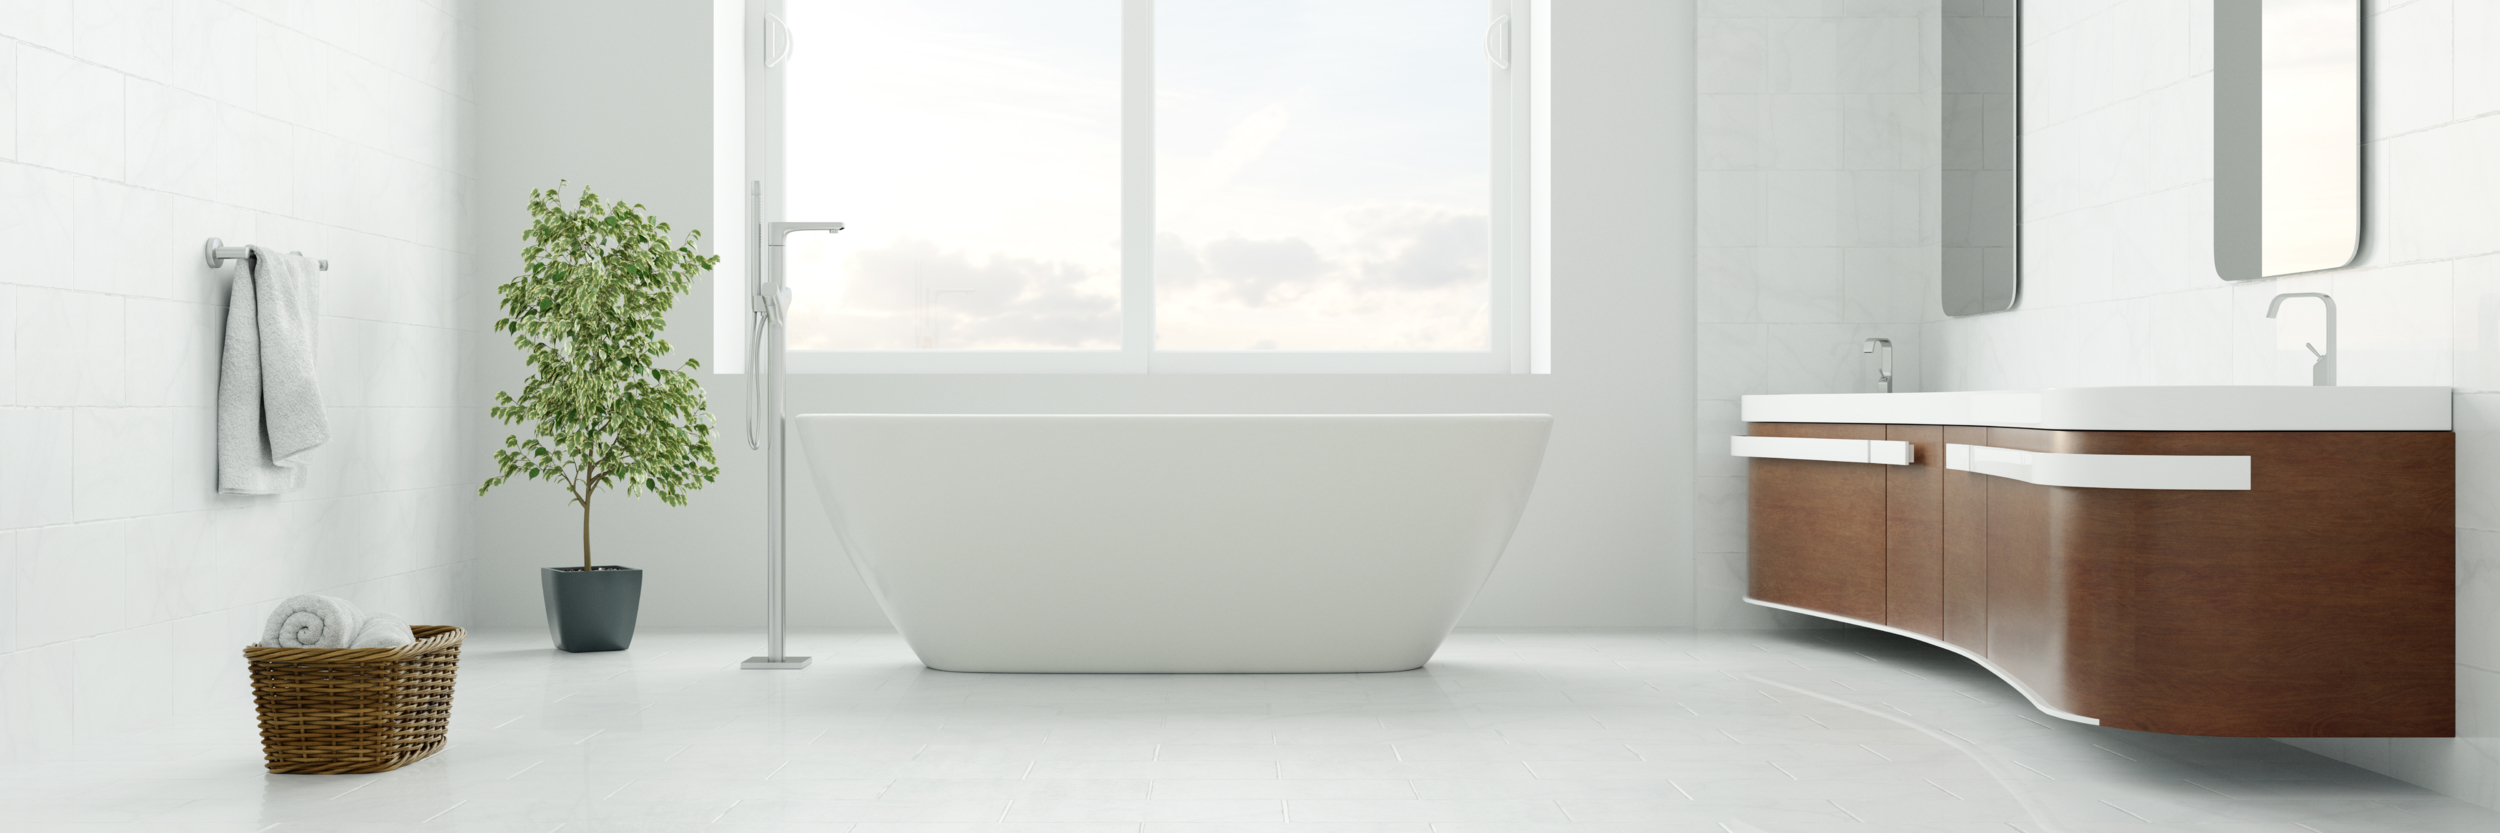 hygiene moderne1